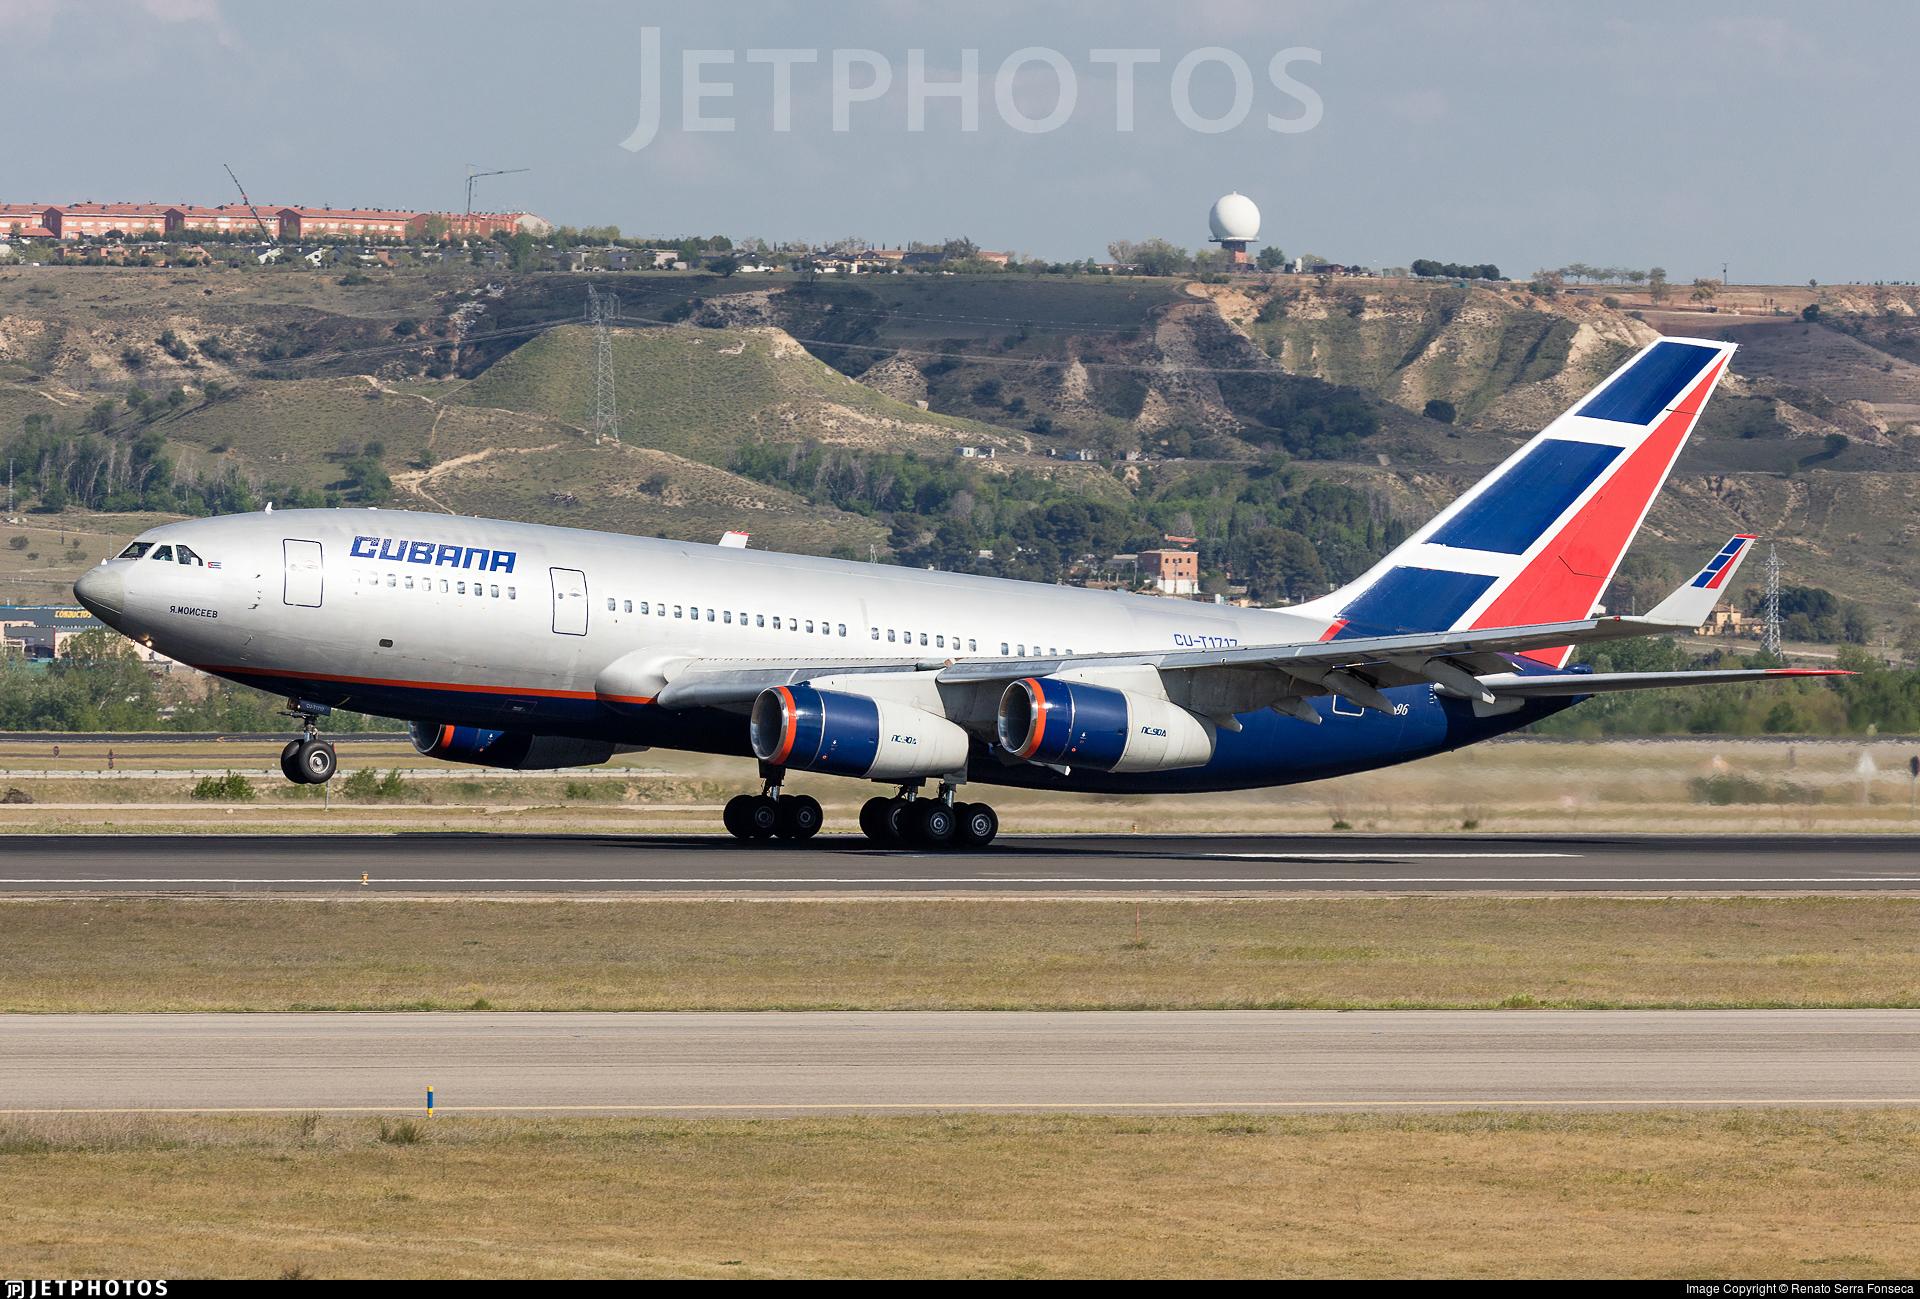 Cu T1717 Ilyushin Il 96 300 Cubana De Aviación Renato Serra Fonseca Jetphotos